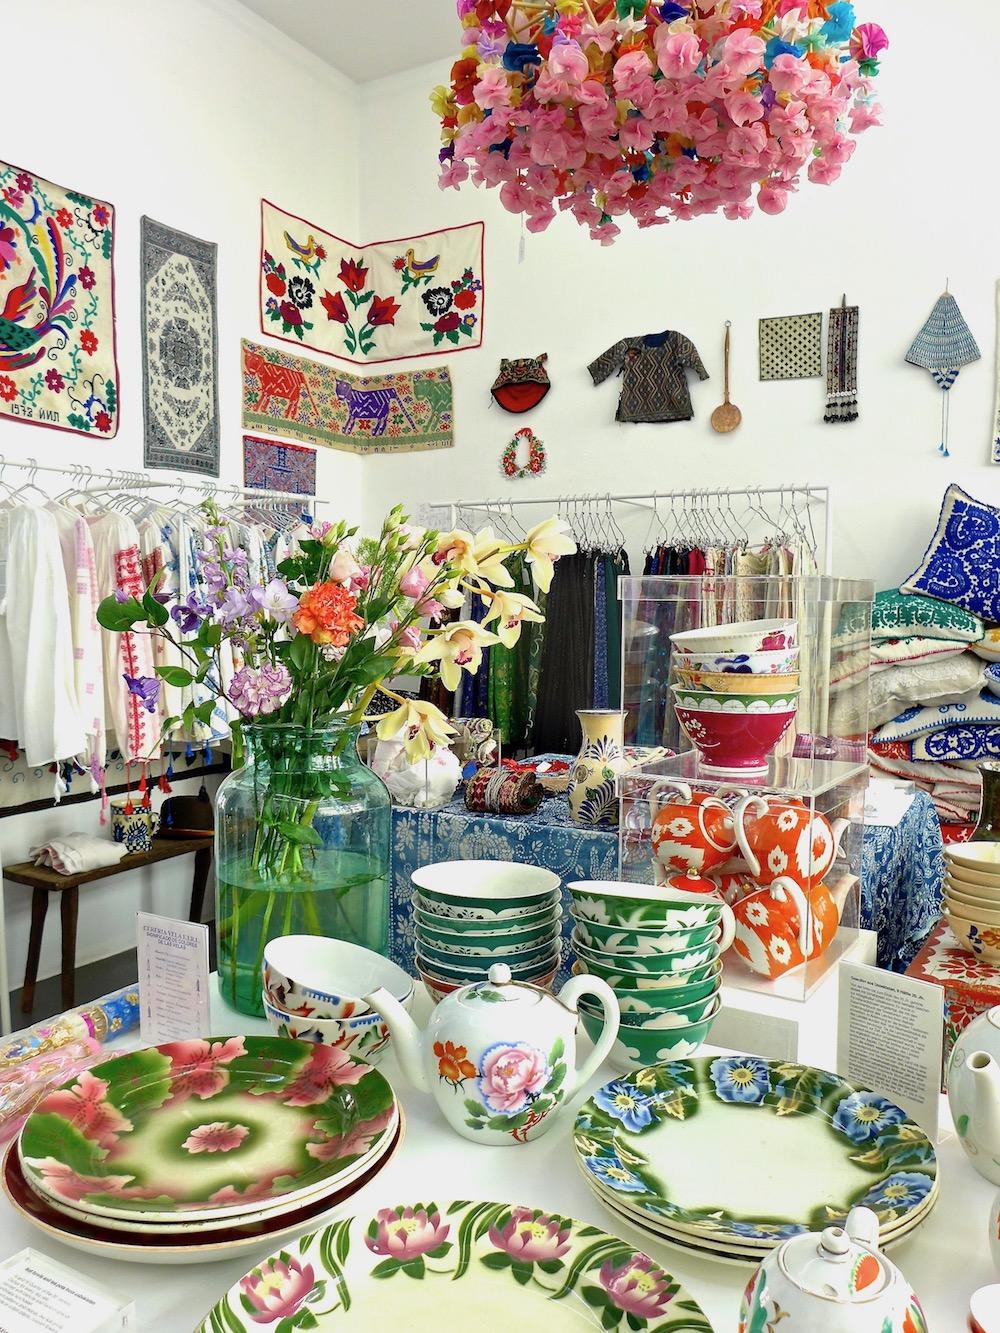 Obchod s tradičním zbožím